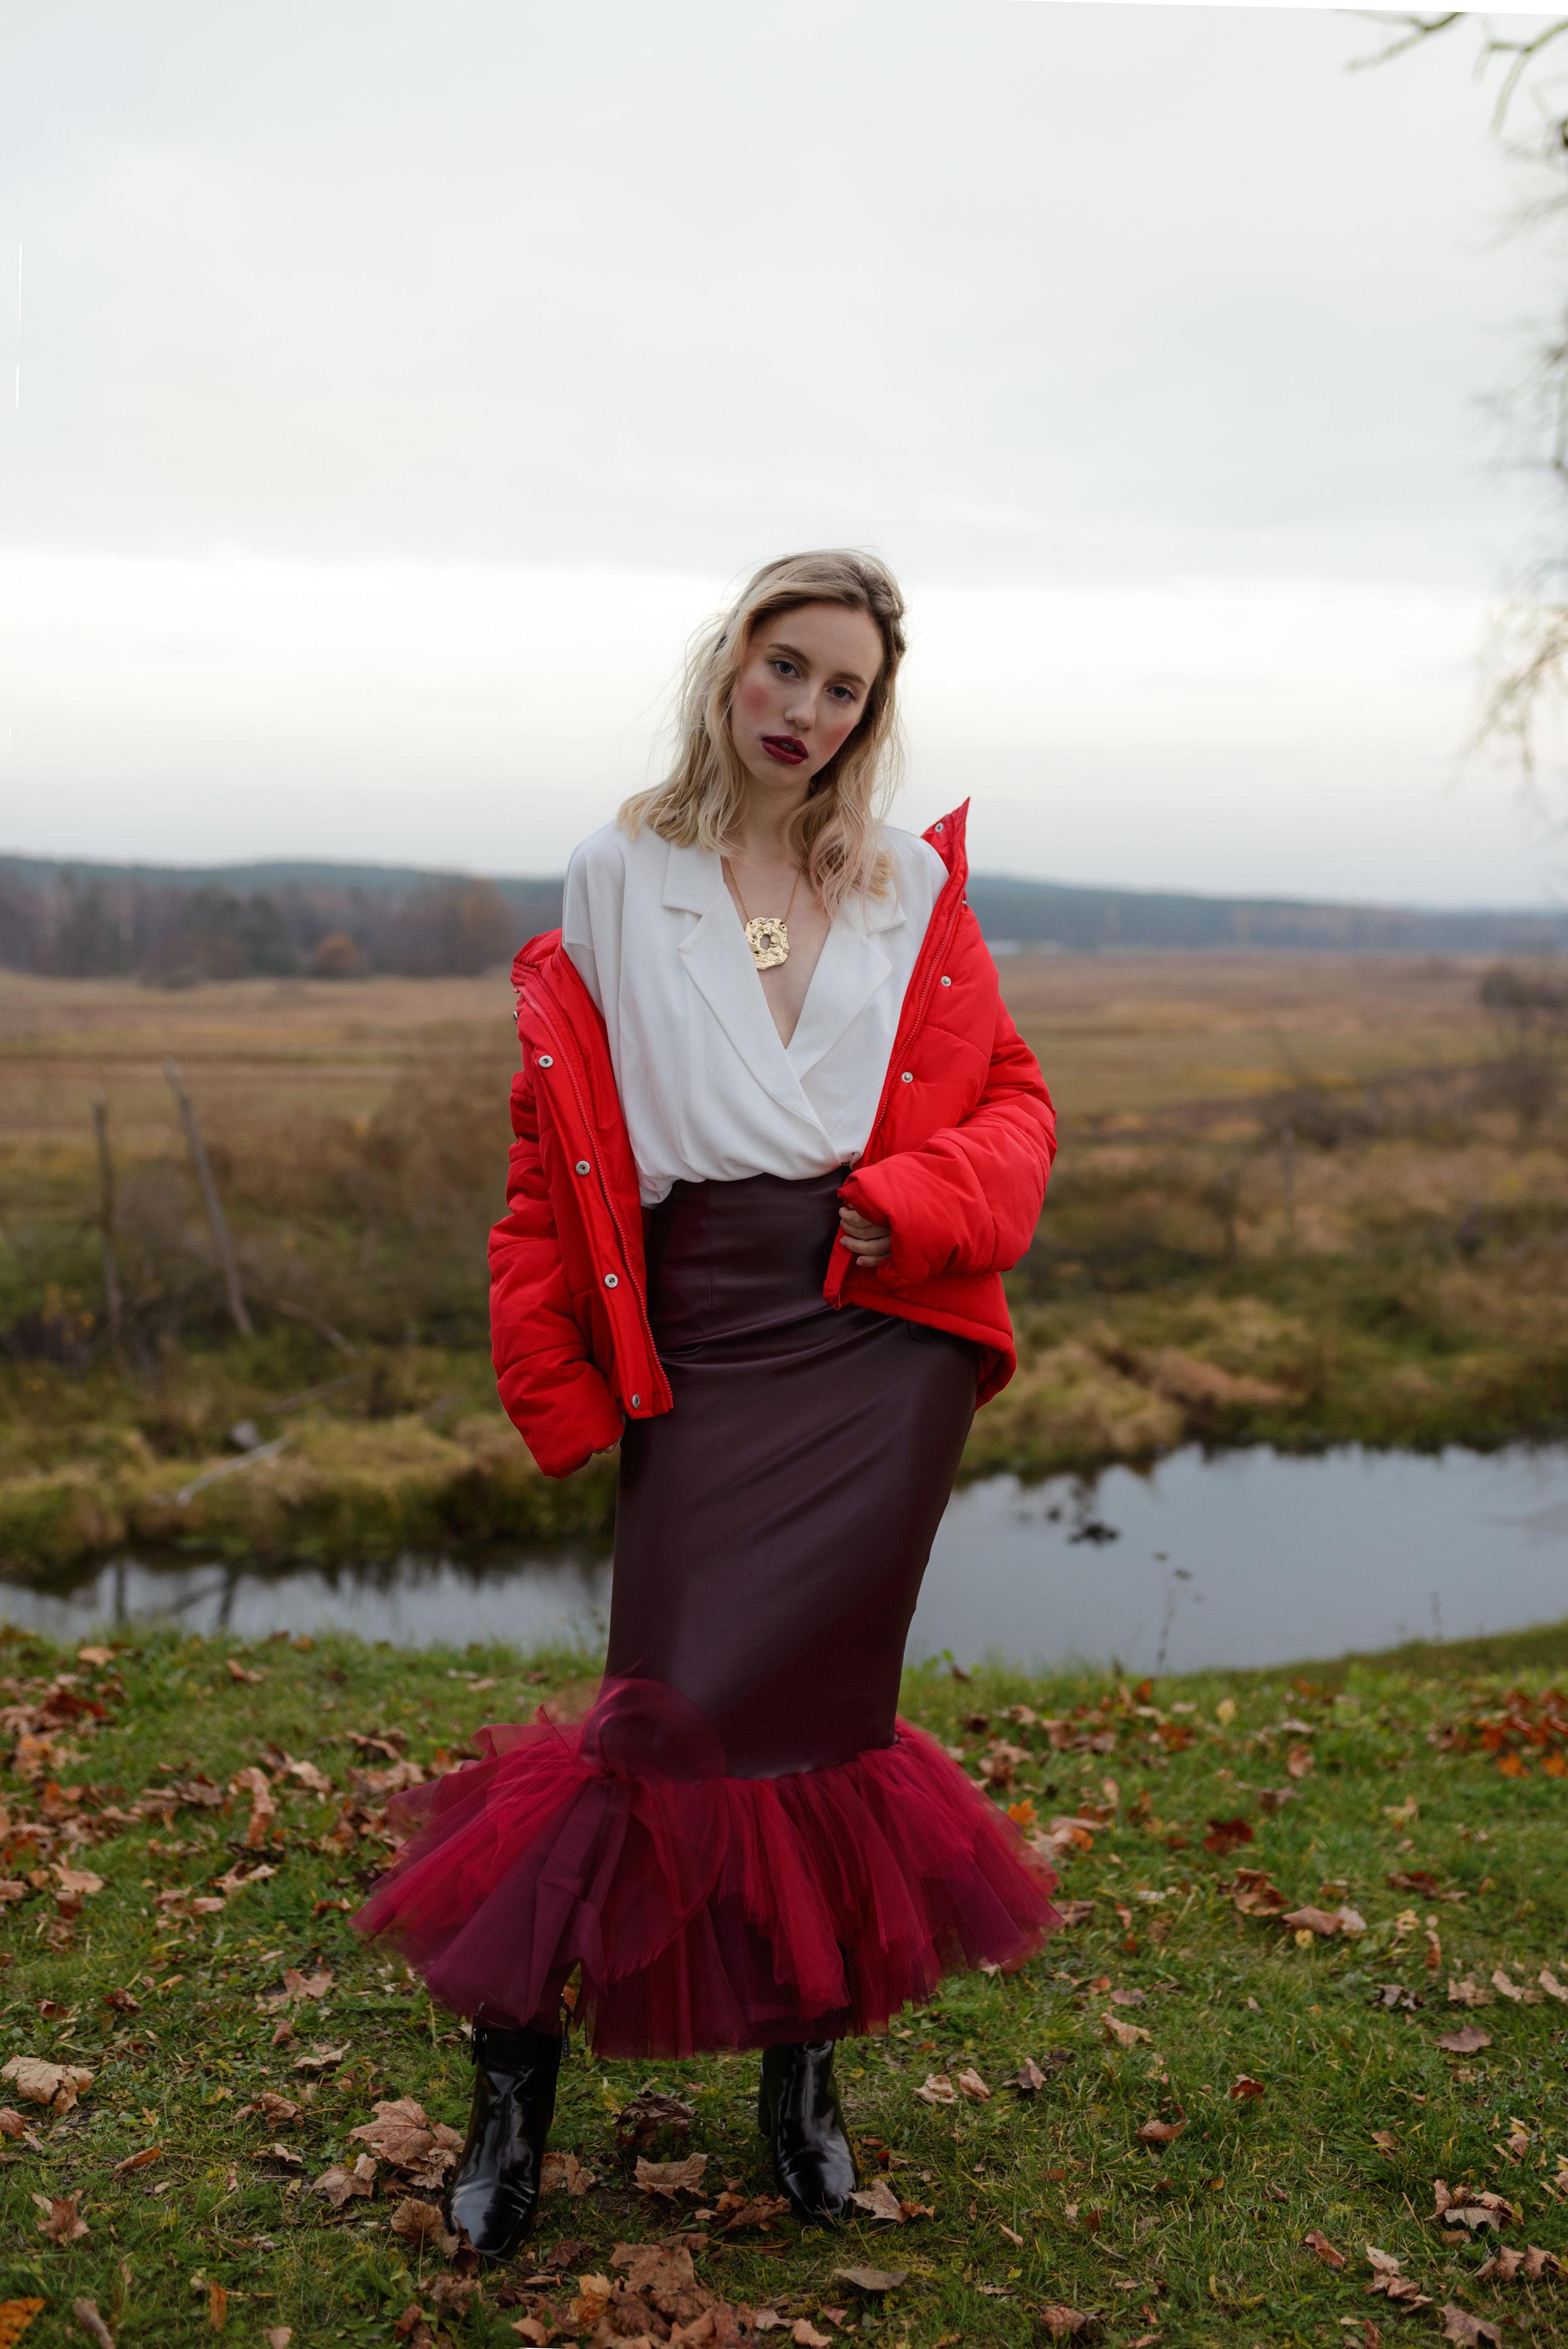 Shirt - H&M  Skirt - Okult Brand  Shoes - Zara  Jacket - Mango  Necklace - H&M